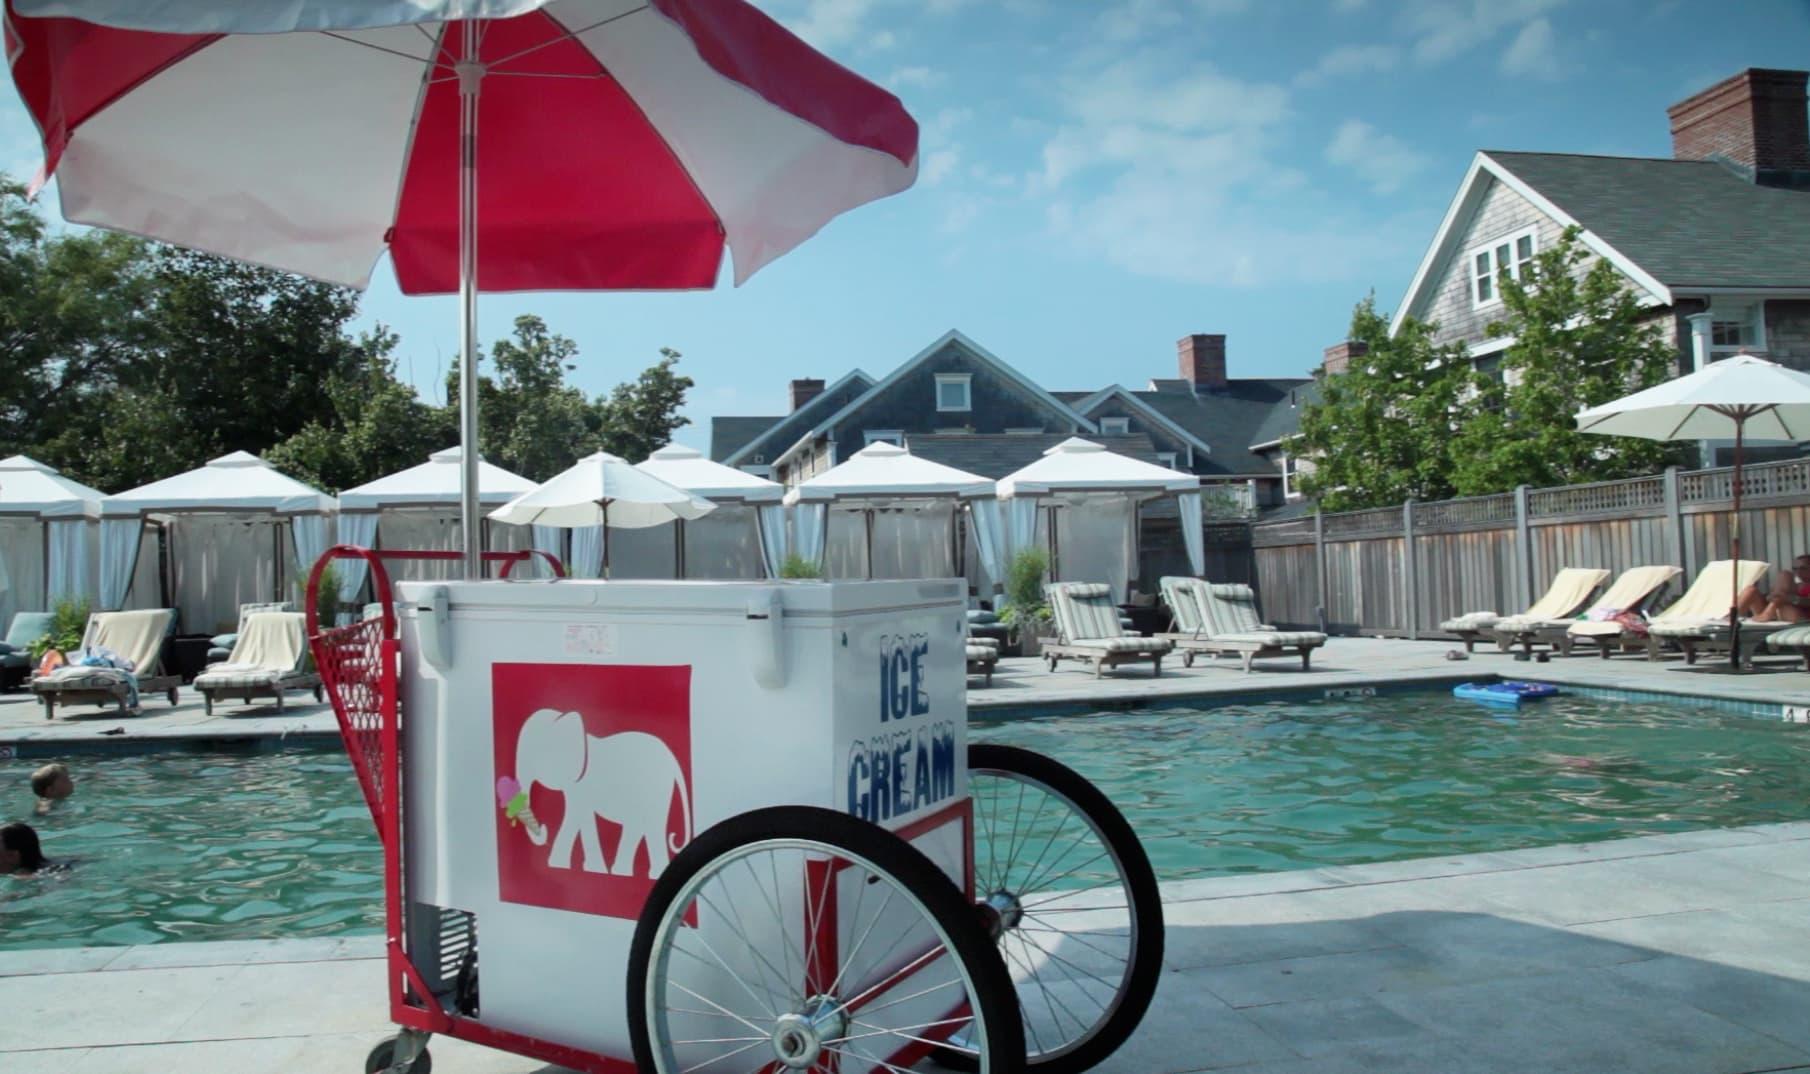 White Elephant Village Ice Cream Cart